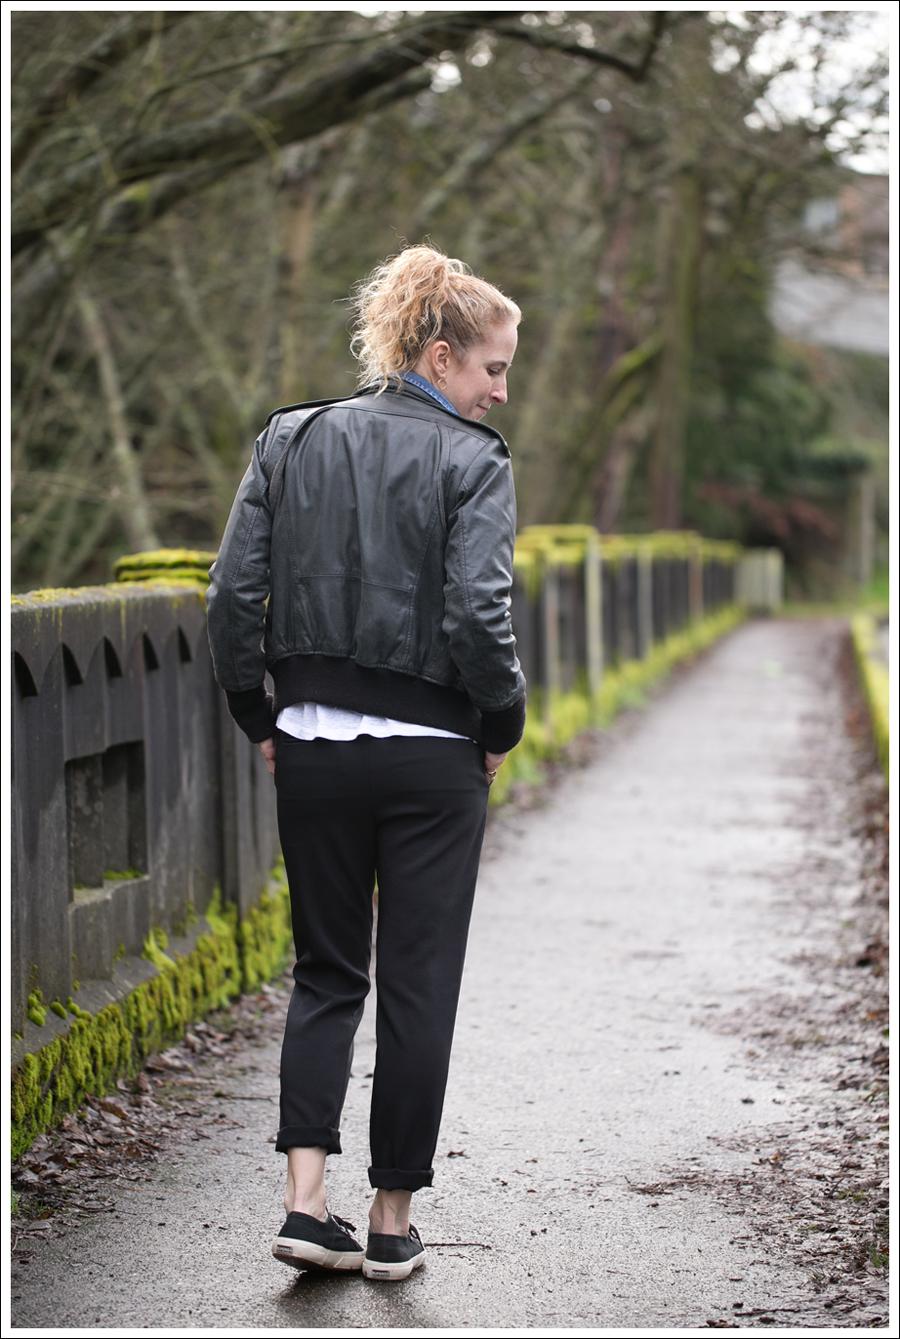 Blog Doma Leather Bomber Jacket Gap Denim Shirt Zara J Brand Irene Pant Black Superga-3